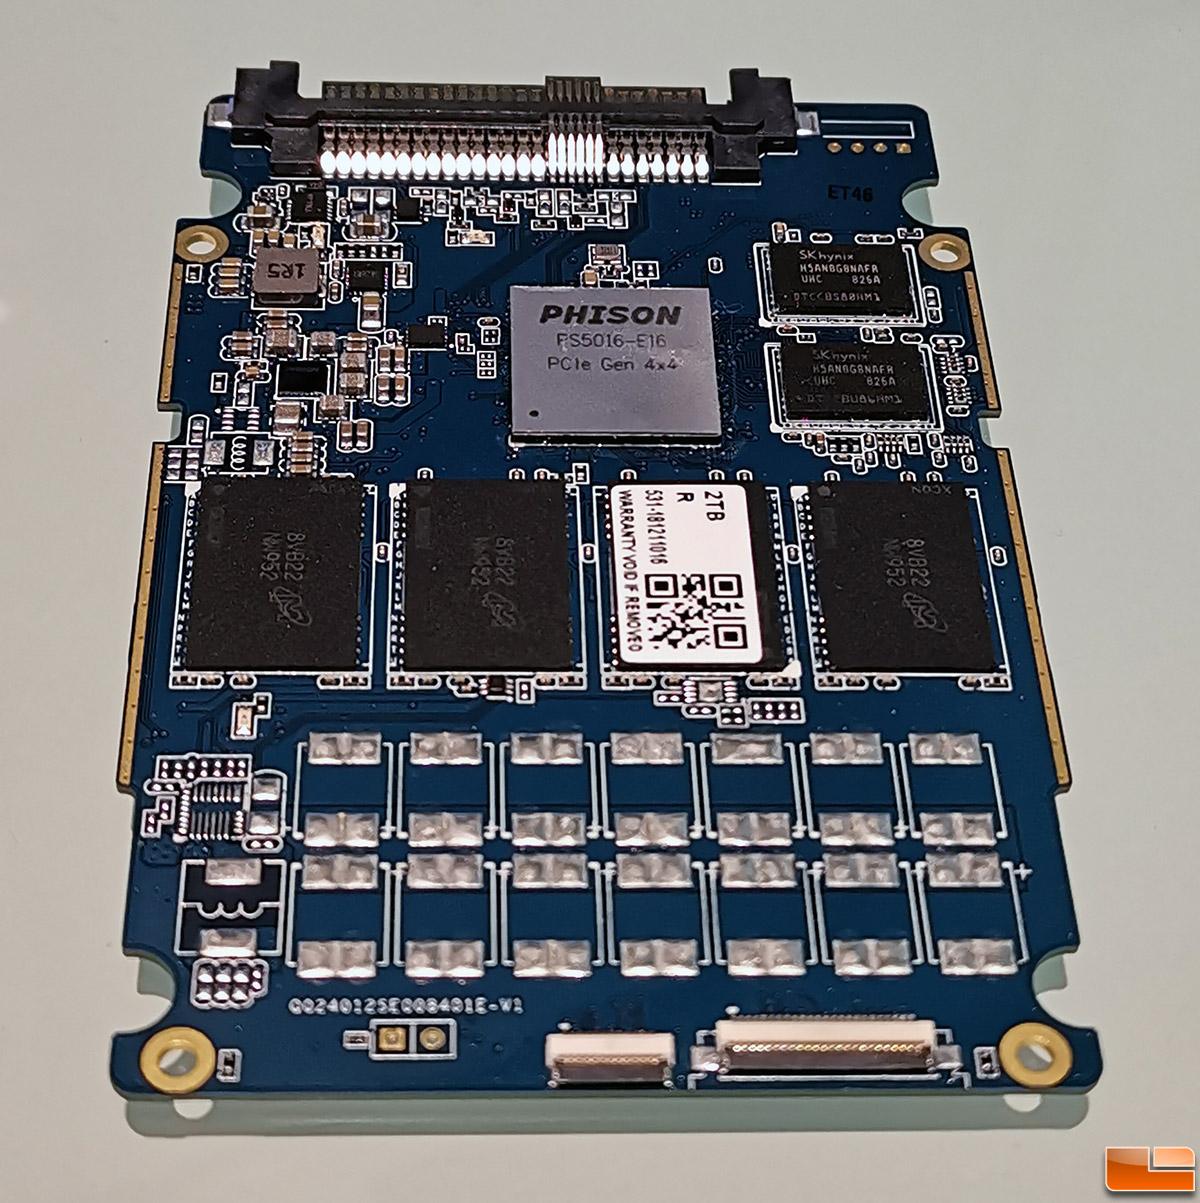 phison-ps5016-e16-prototype-lr.jpg